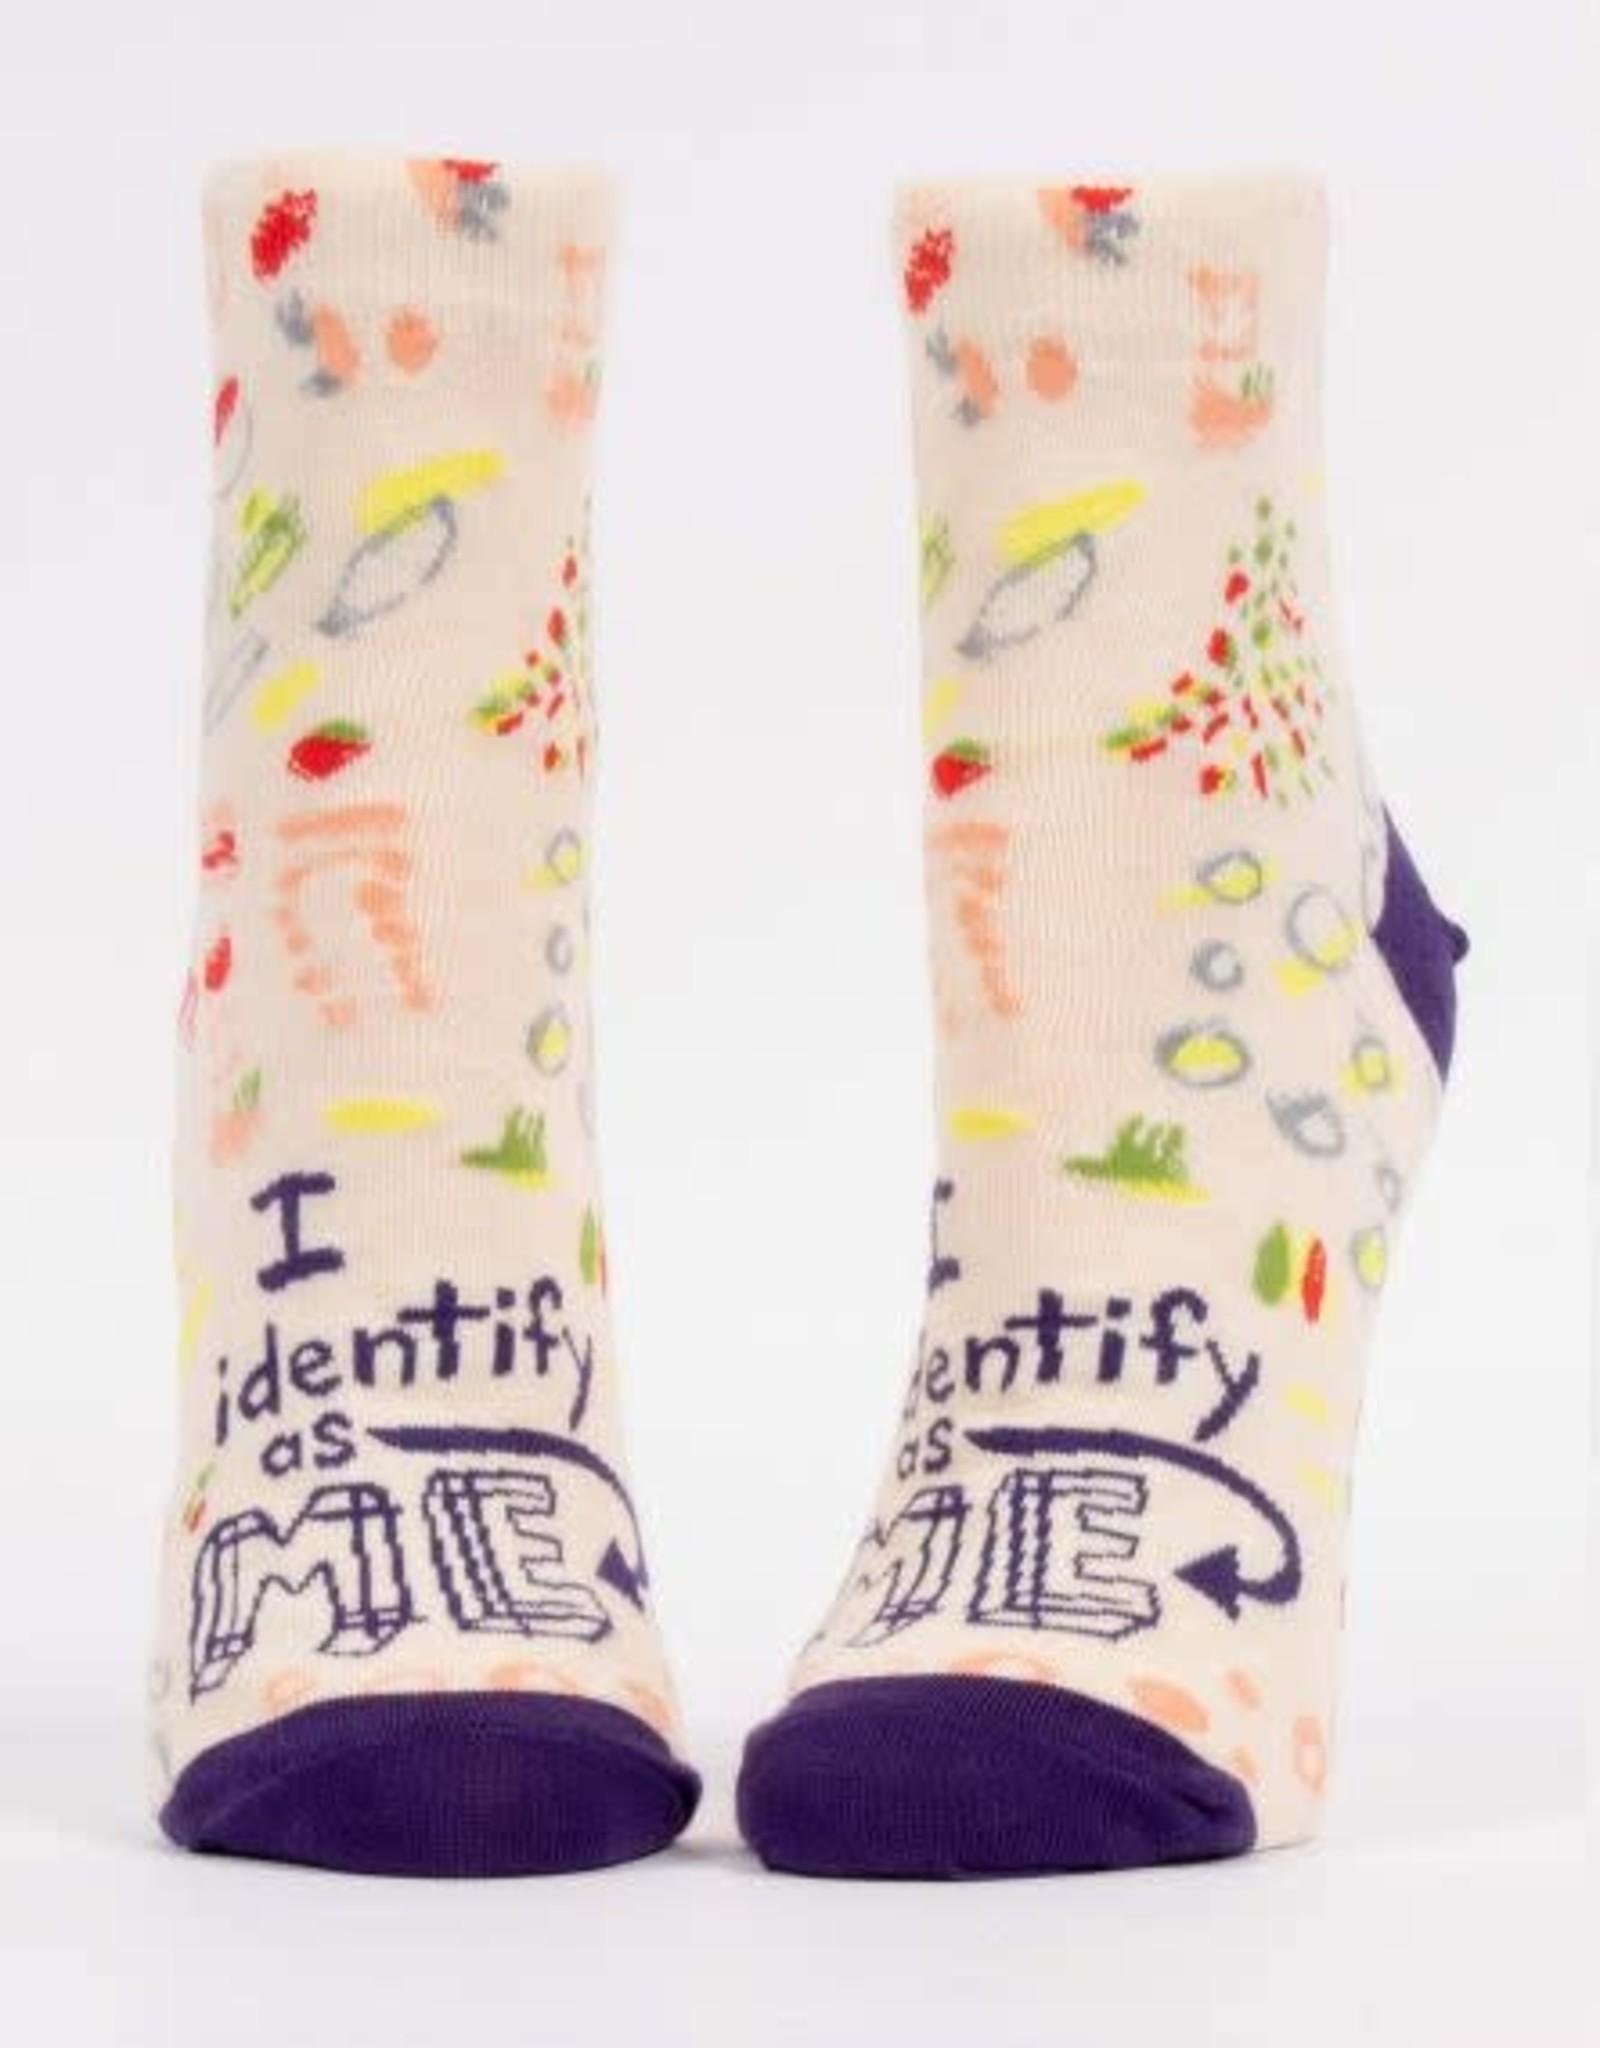 Blue Q Blue Q Women's Ankle Socks I Identify as Me